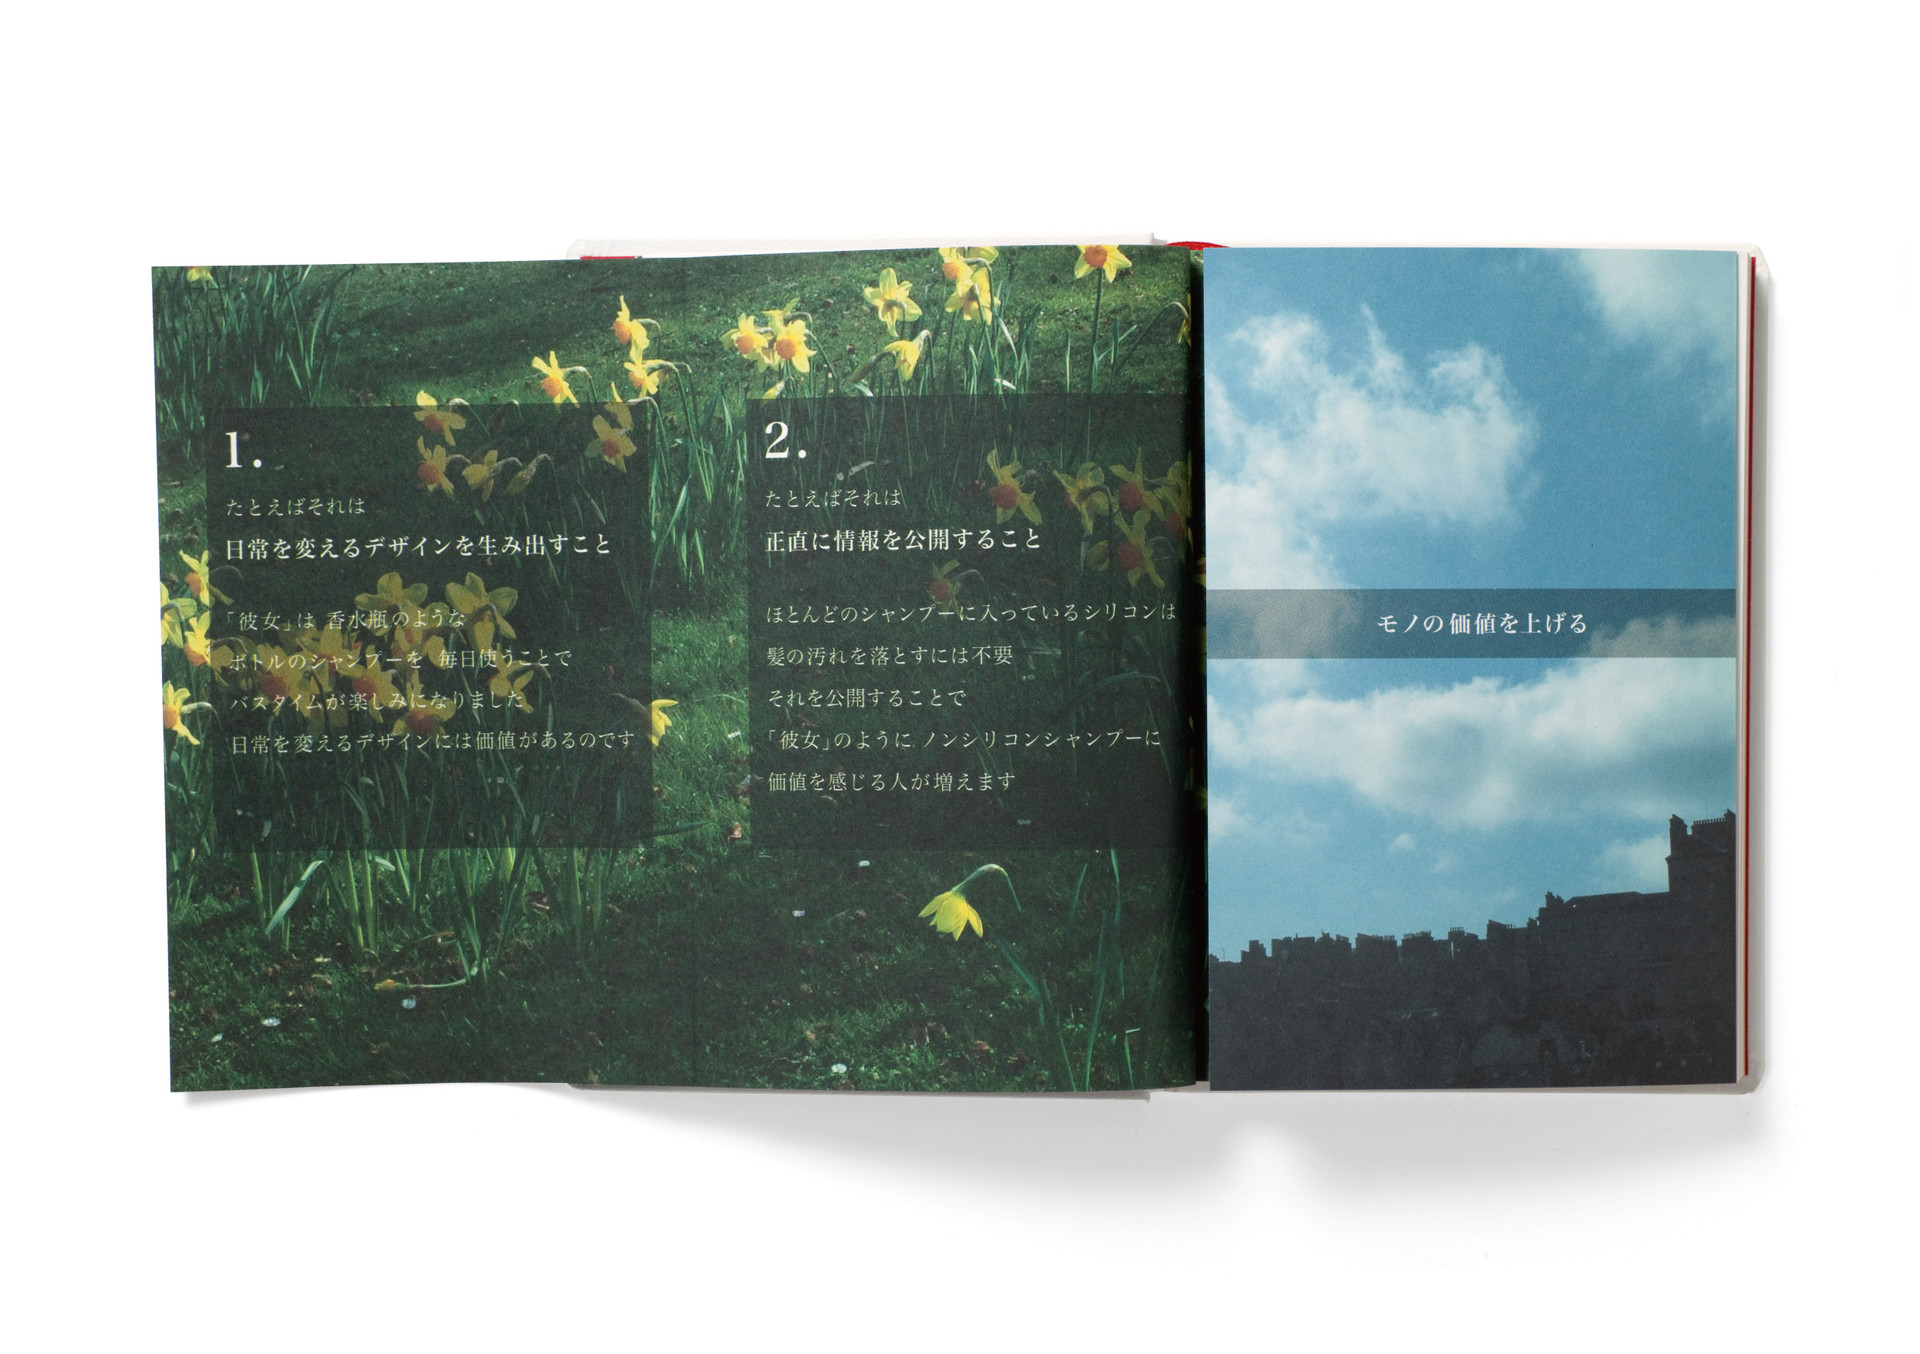 japangateway-3.jpg